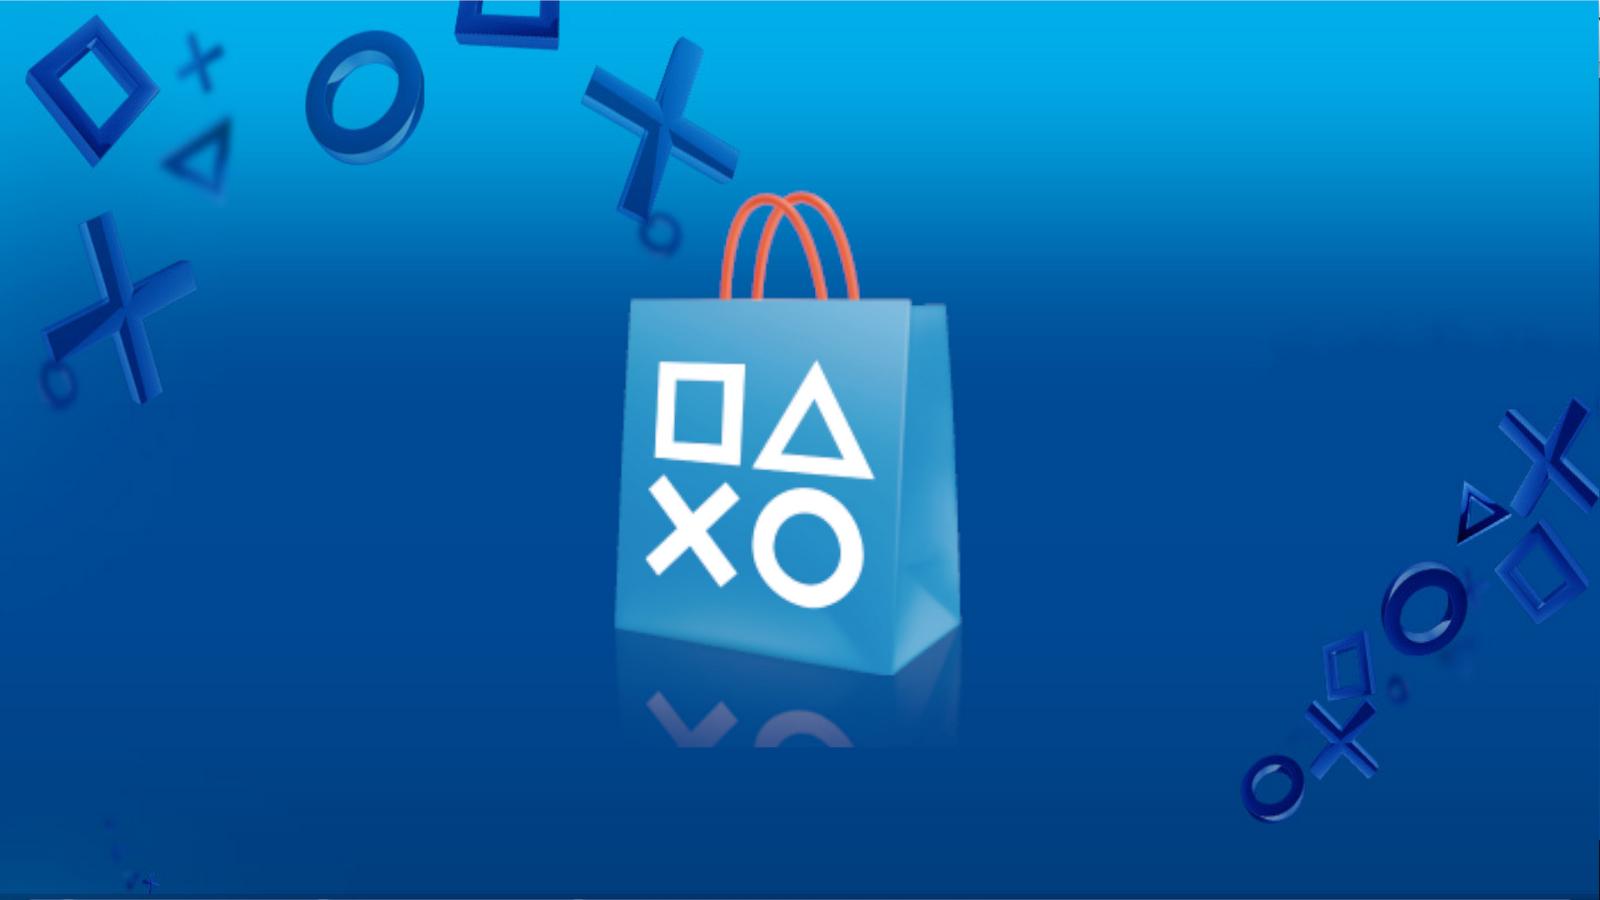 RDR 2, Assassins Creed Valhalla и другие со скидками до 55 %: в PS Store началась акция с хитами Ubisoft и Take-Two